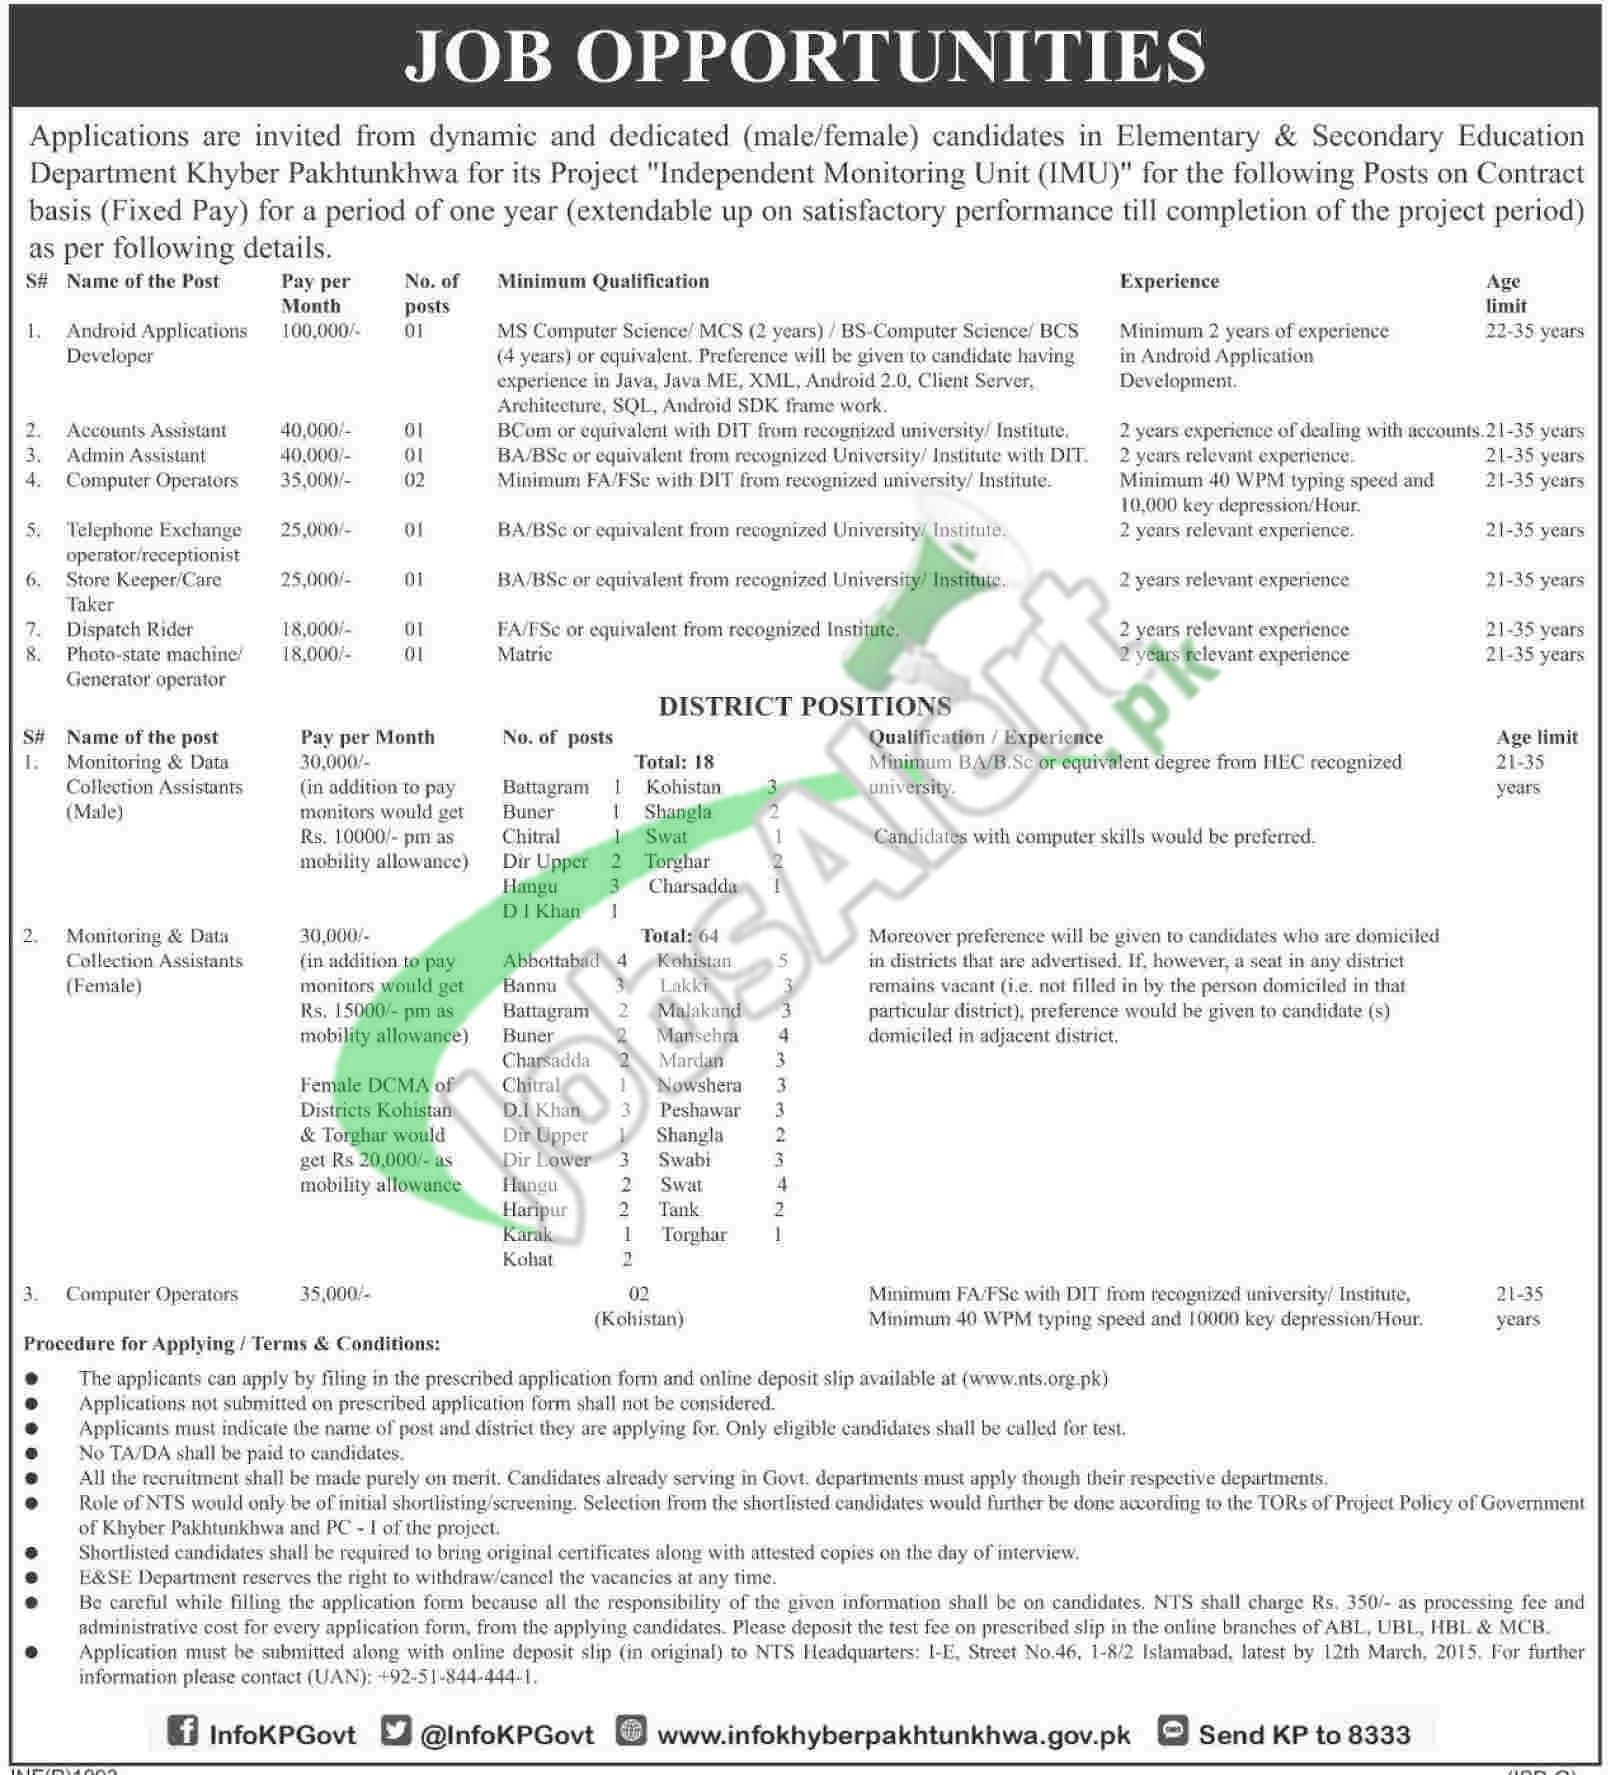 Jobs in Elementary & Secondary Education KPK